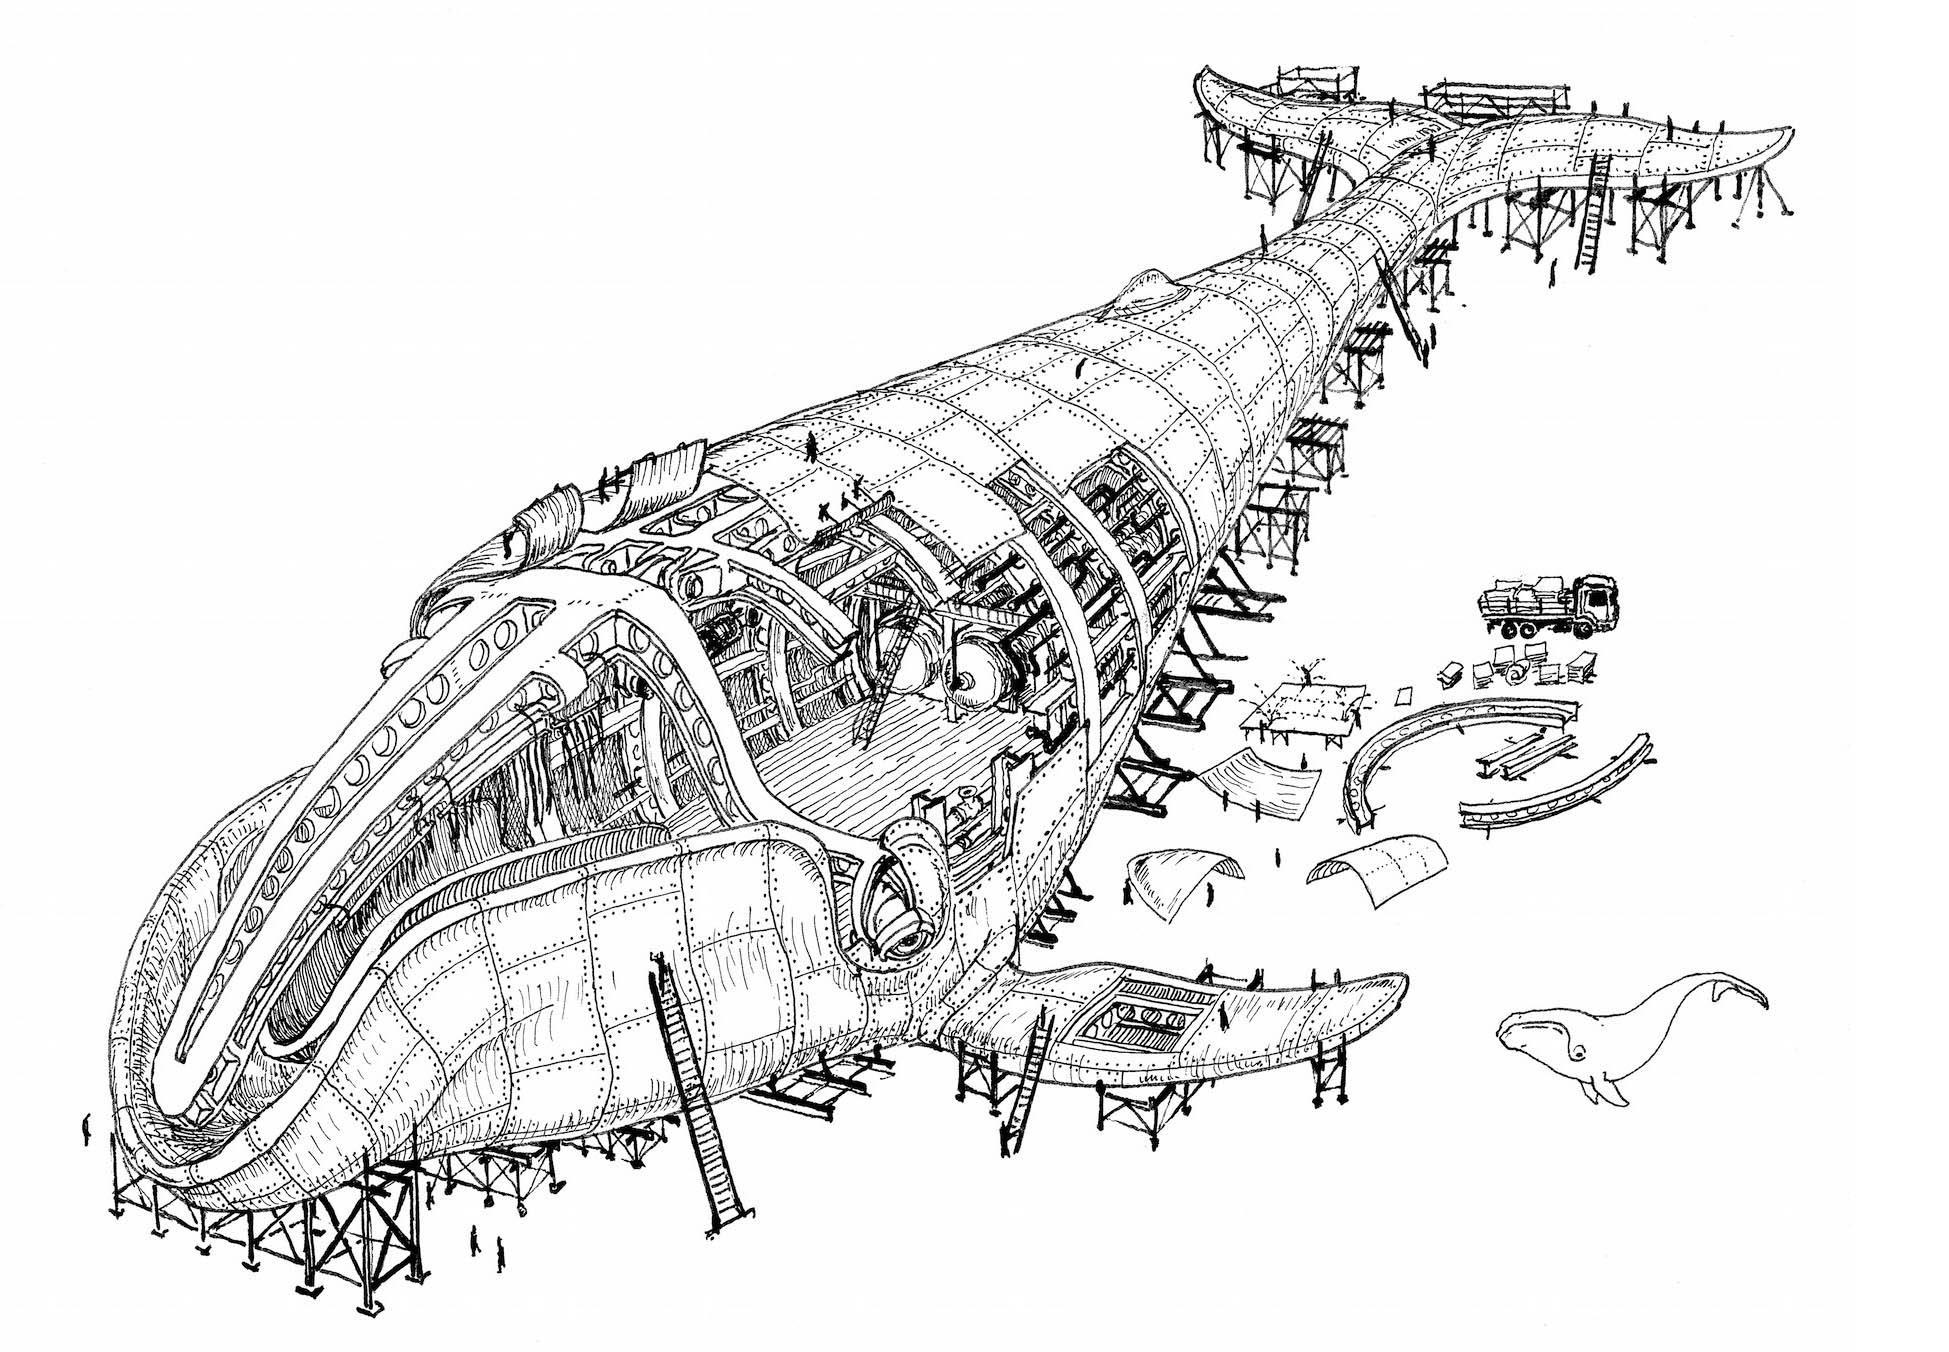 it u2019s a bird  u2026 it u2019s a plane  u2026 it u2019s architecture